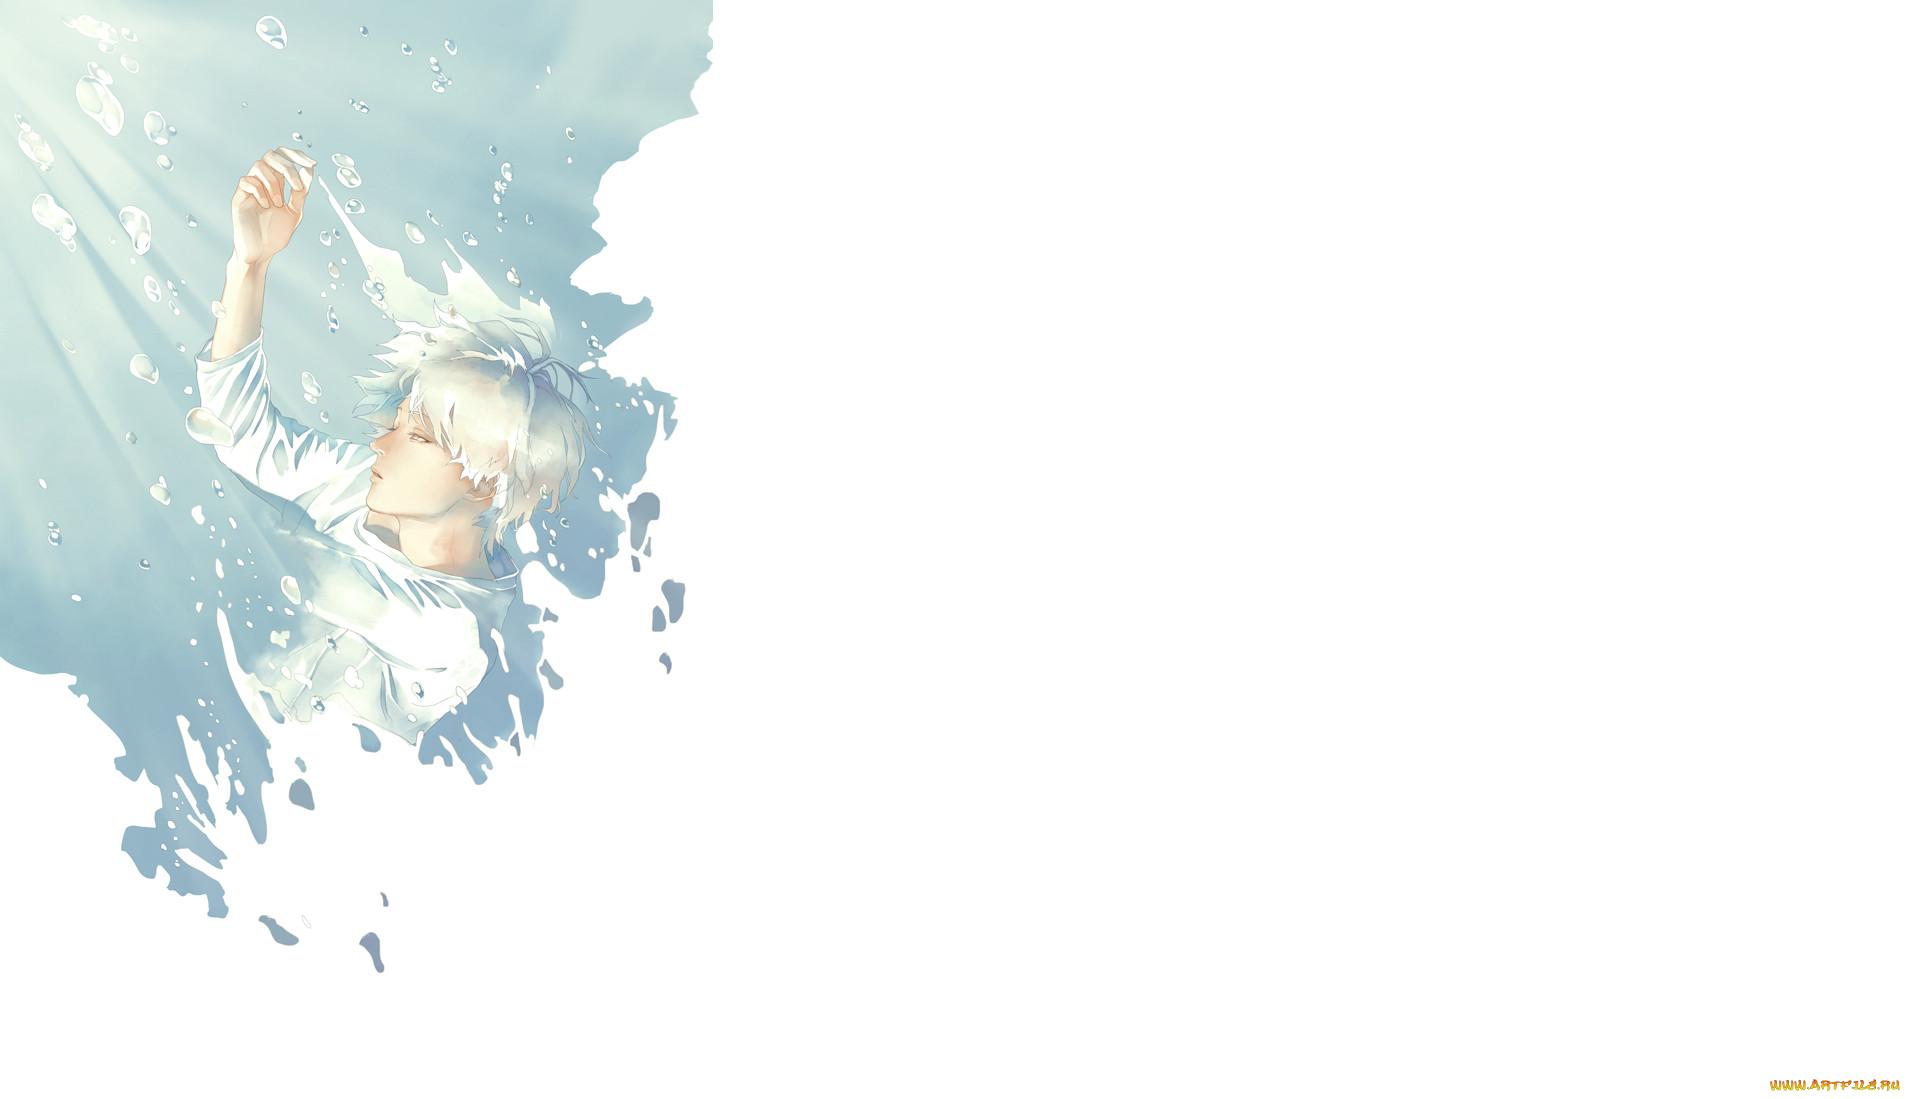 аниме, unknown,  другое, арт, re, парень, вода, пузыри